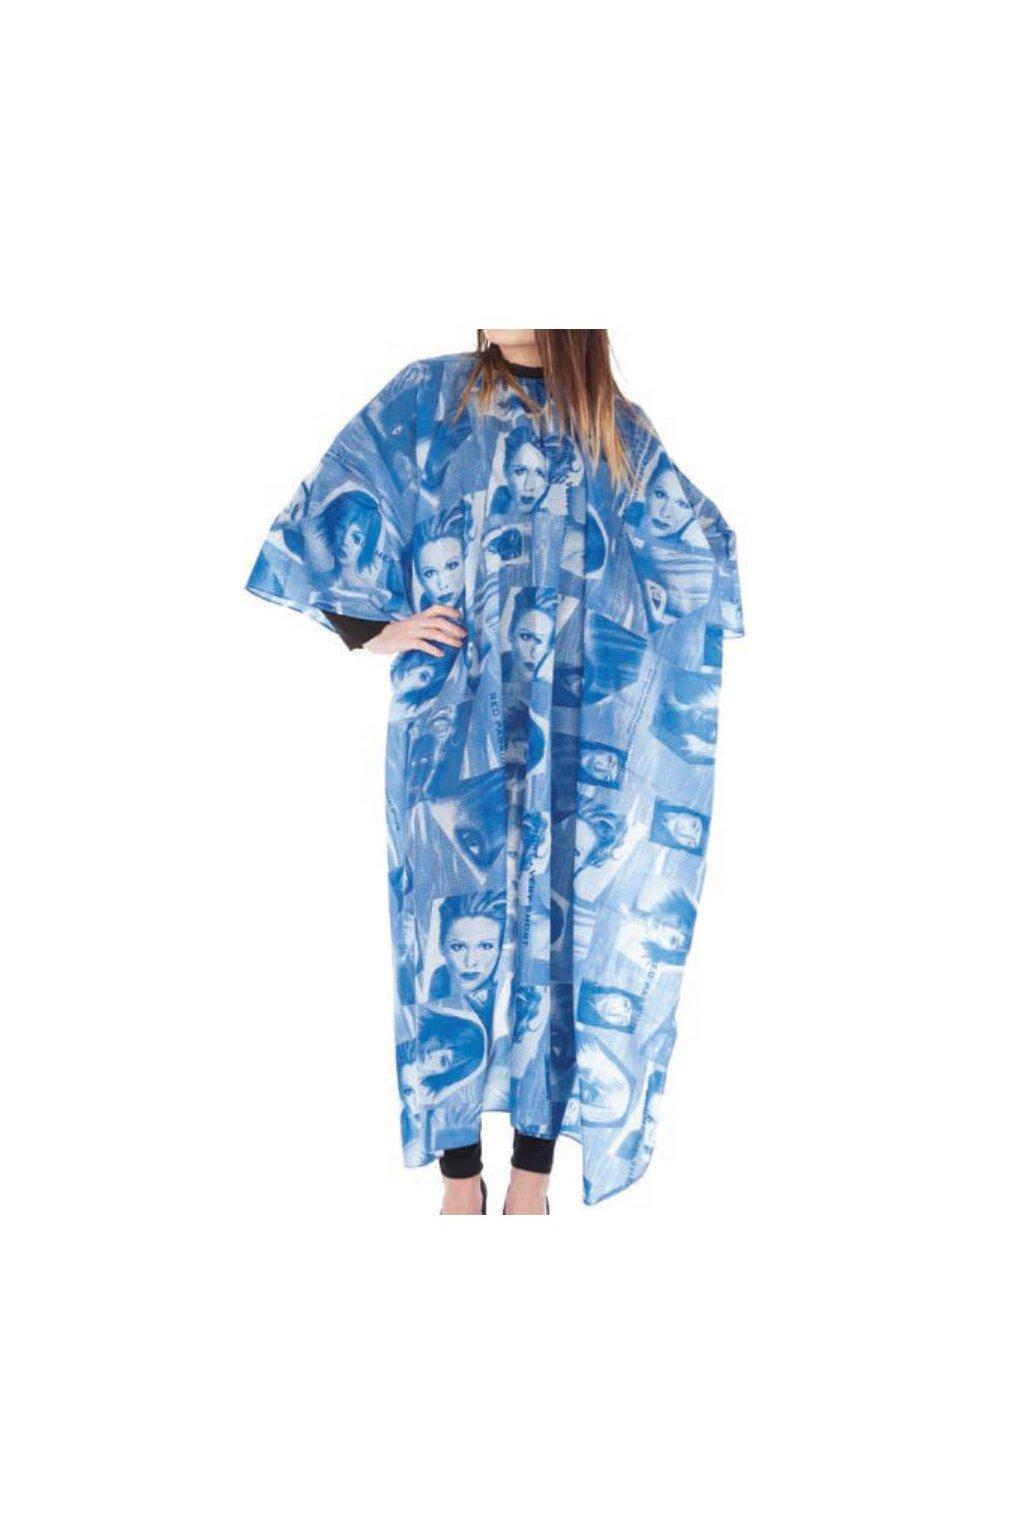 8021 kadernicky plast blu na strihani vzor nepravidelne modre obrazce hlavy 125x168cm